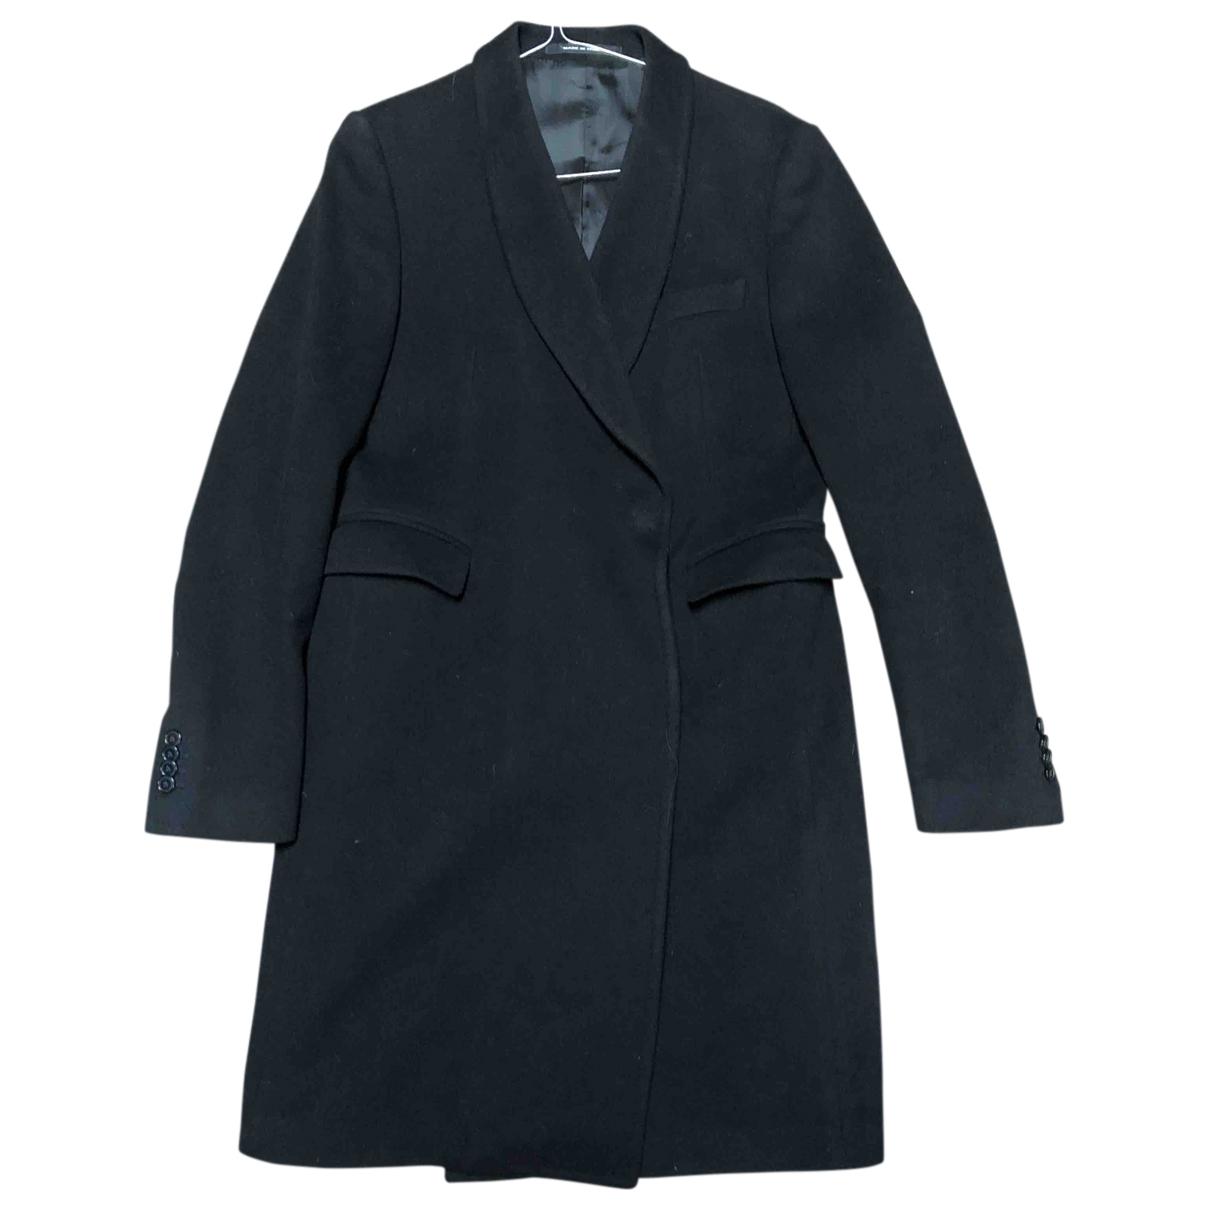 Tagliatore \N Black Wool coat for Women 46 IT